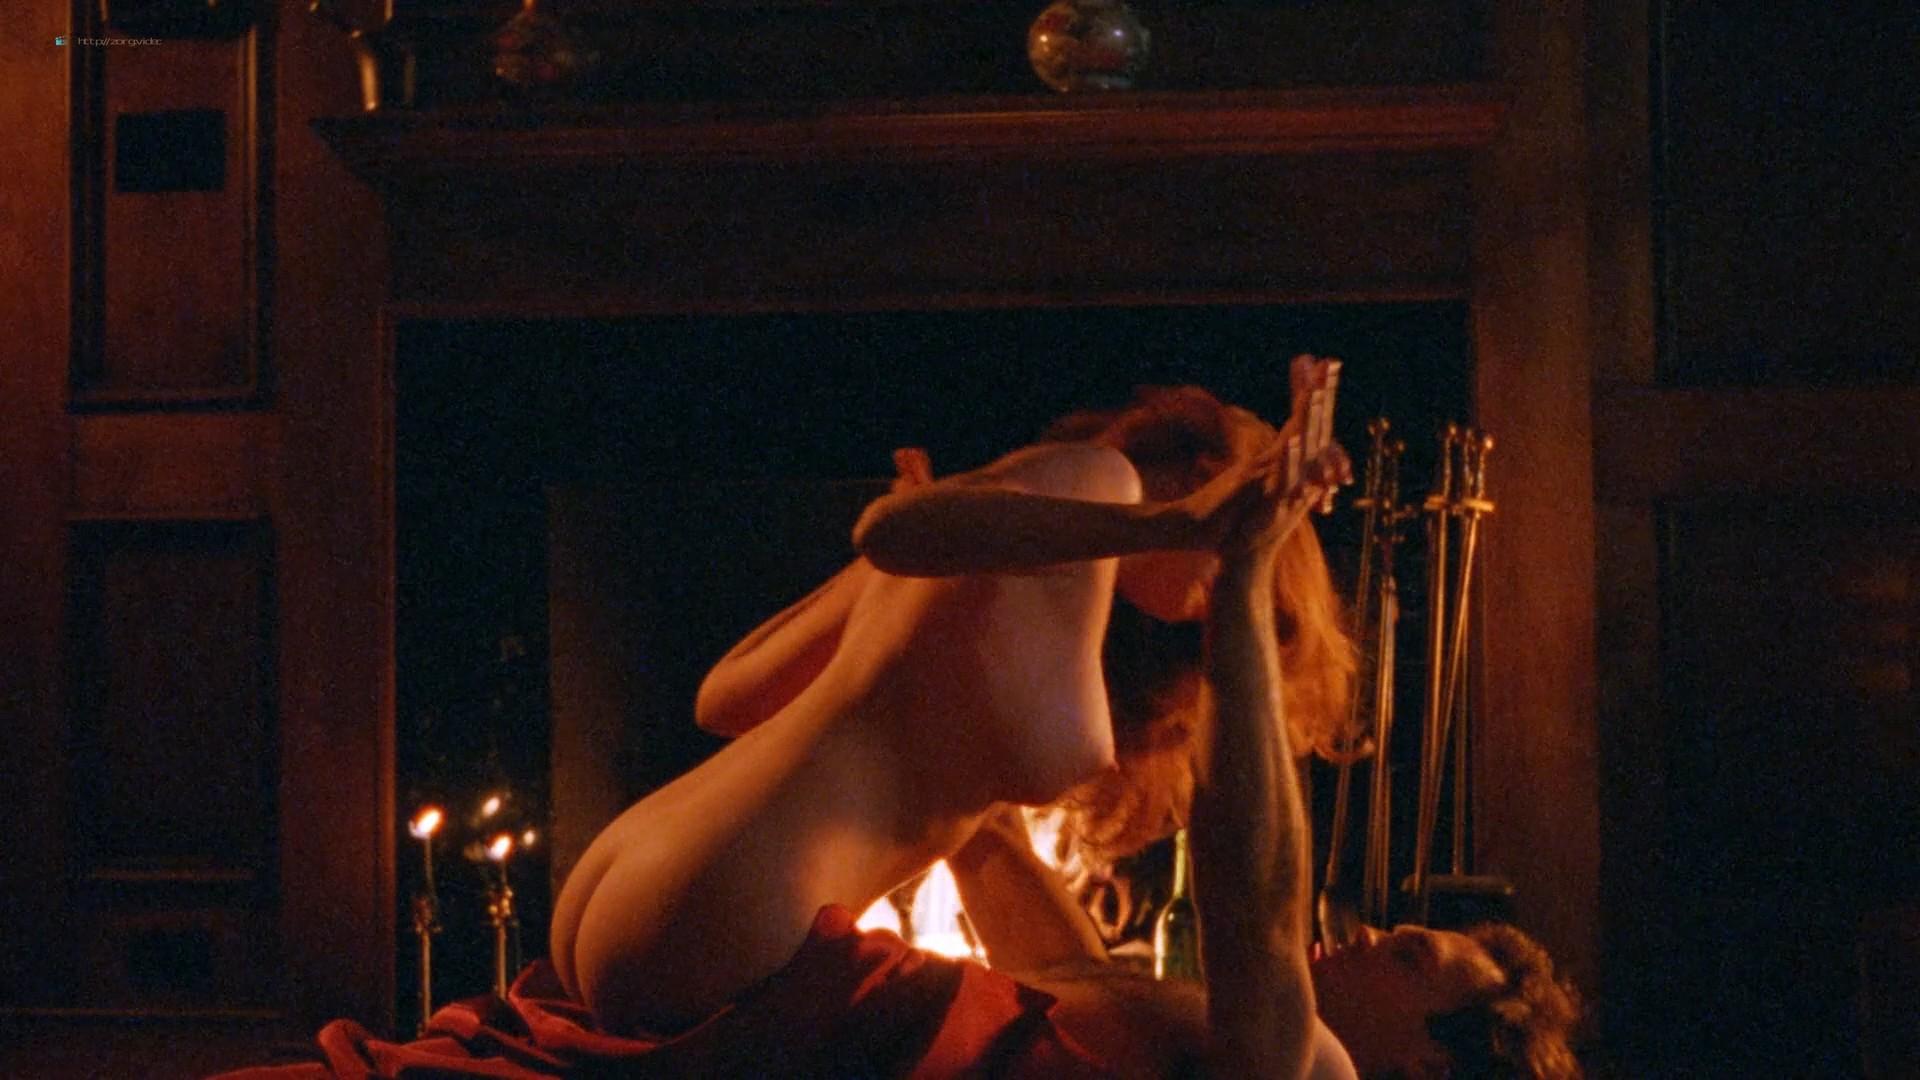 Dona Speir nude Pandora Peaks, Carolyn Liu and others nude too - Do or Die (1991) 1080p BluRay (13)